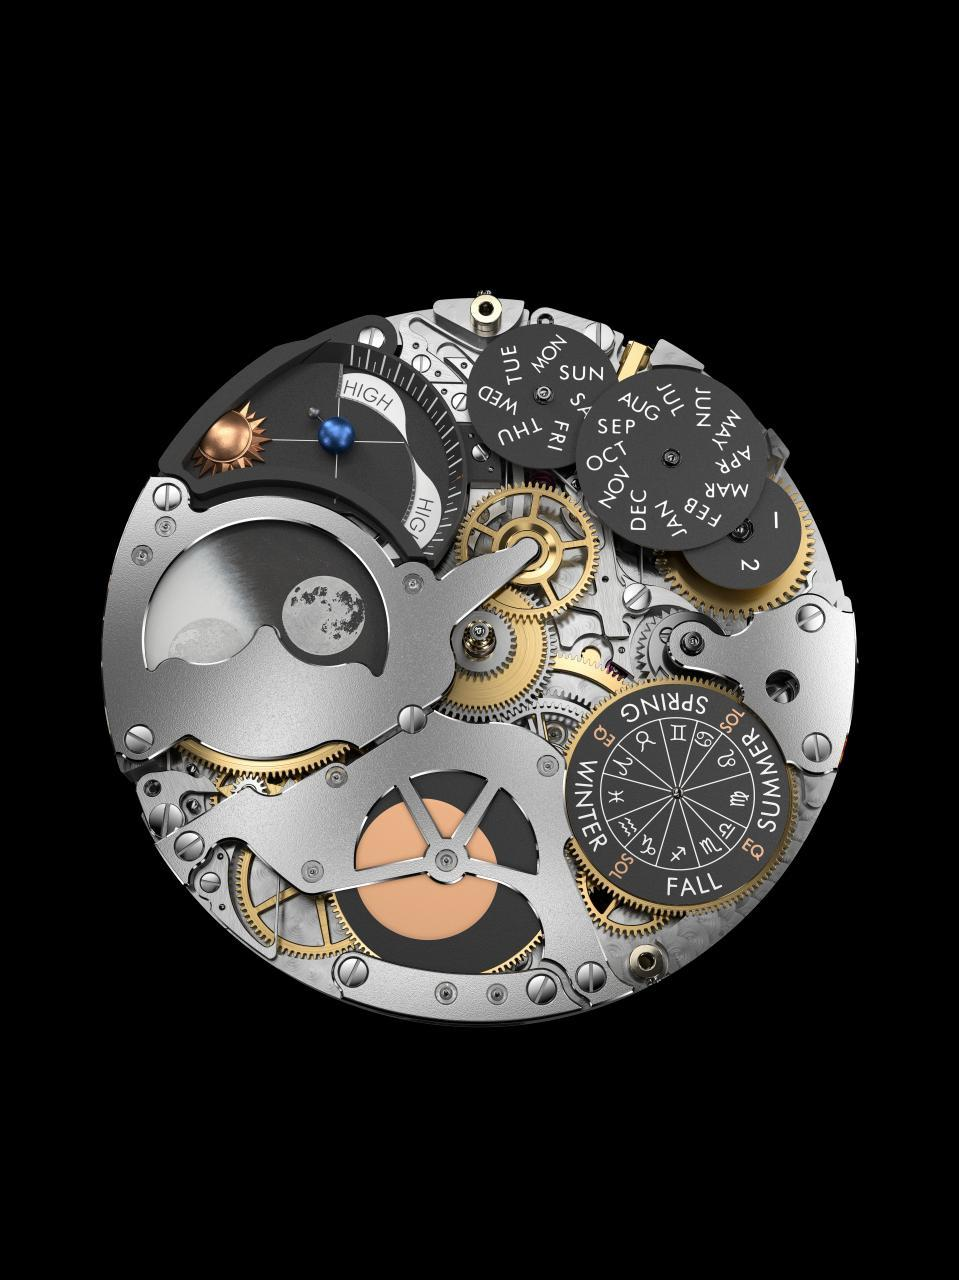 montres de + de 1000 euros - Page 42 Calibre_3600_front_1464015